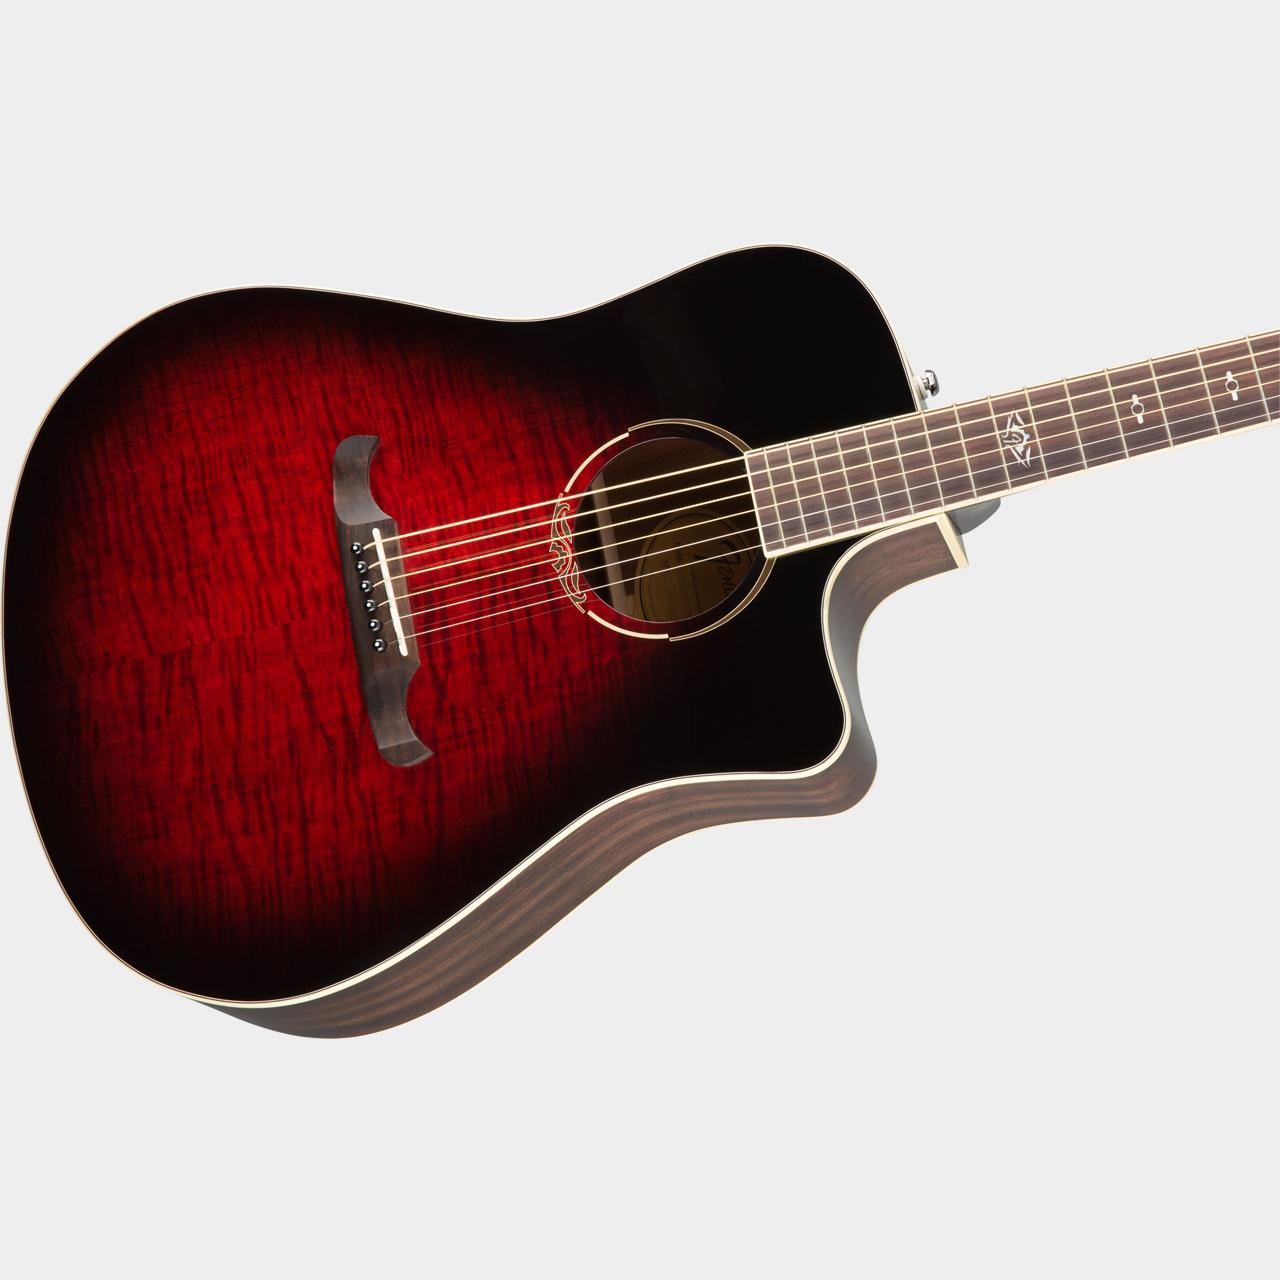 Fender T-Bucket 300CE Flame Maple Trans Cherry Burst